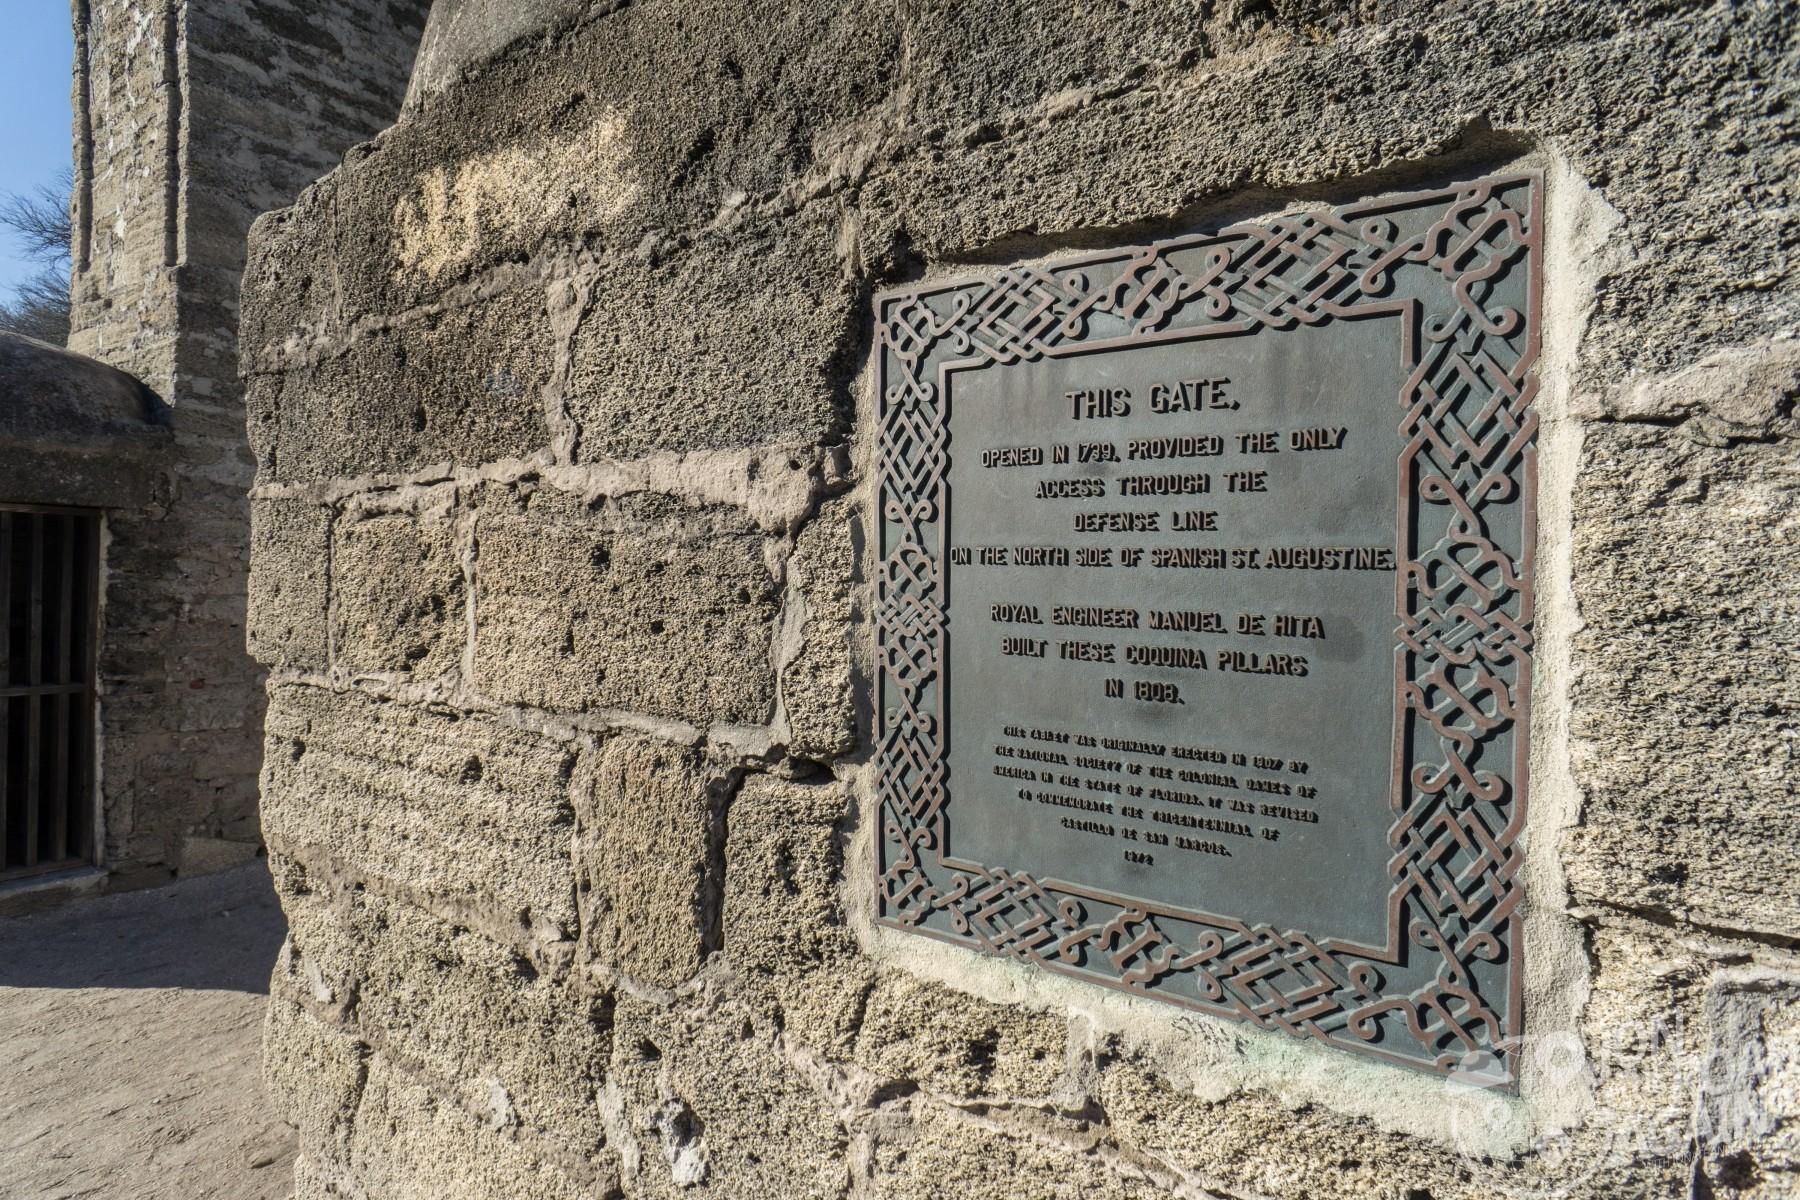 St. Augustine Gates Plaque